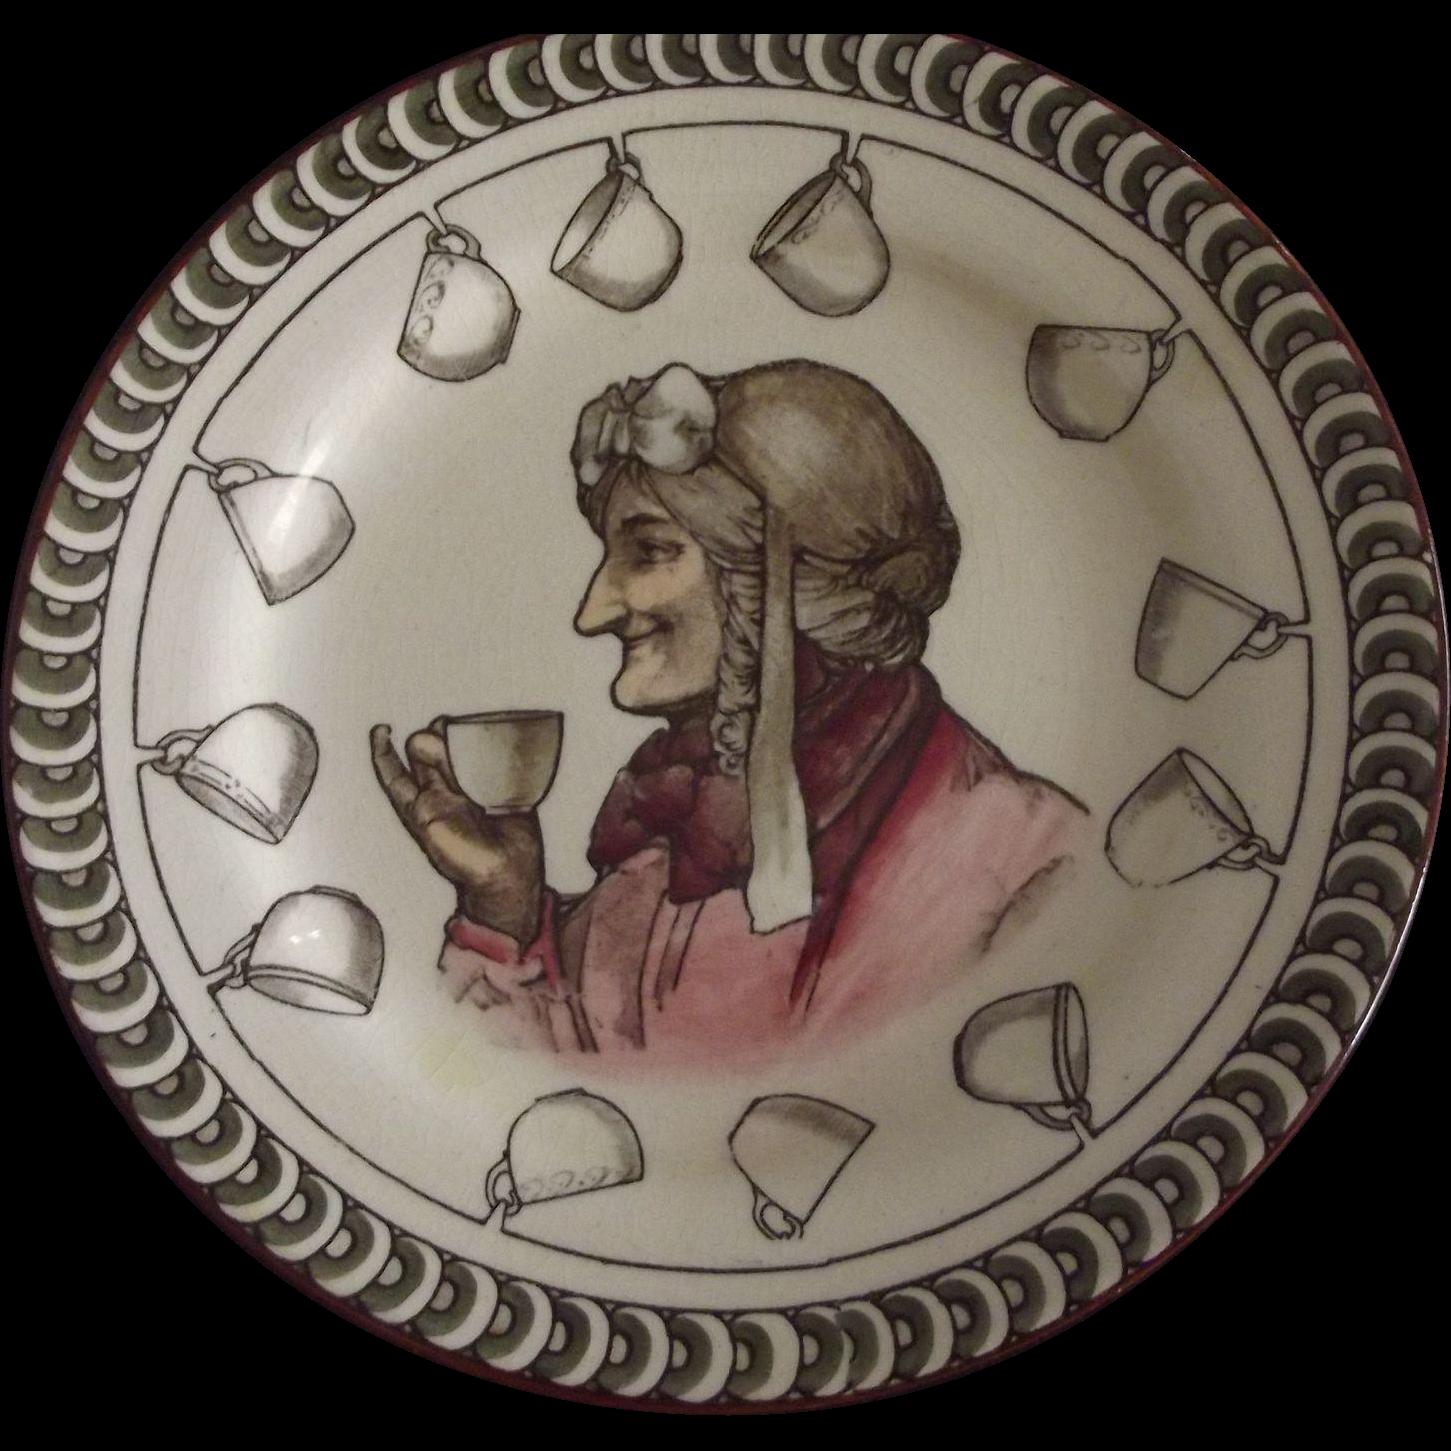 Royal Doulton Teatime Plate